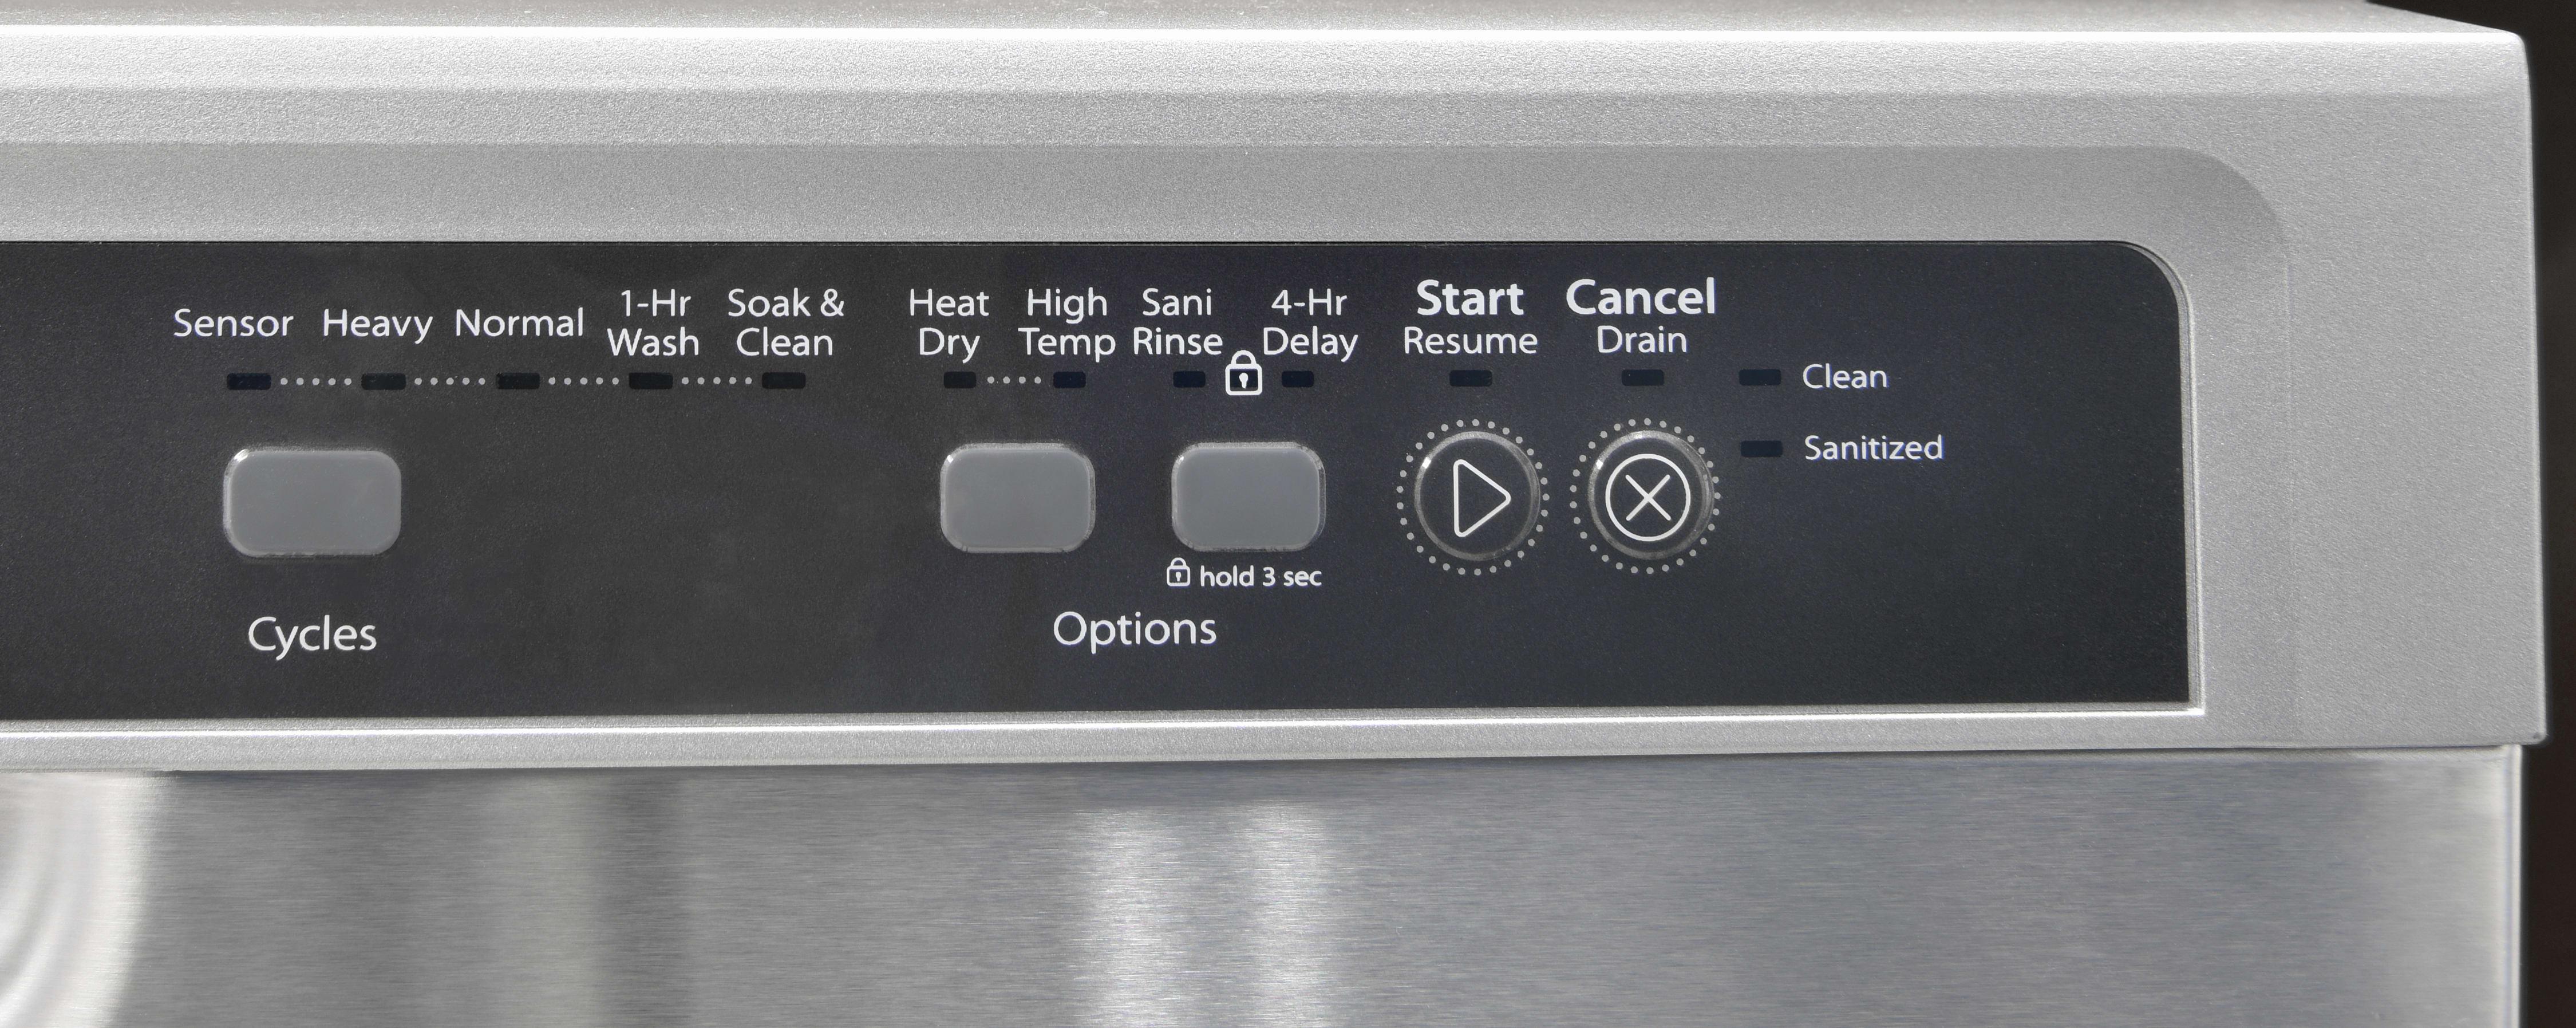 Whirlpool WDF540PADM controls off